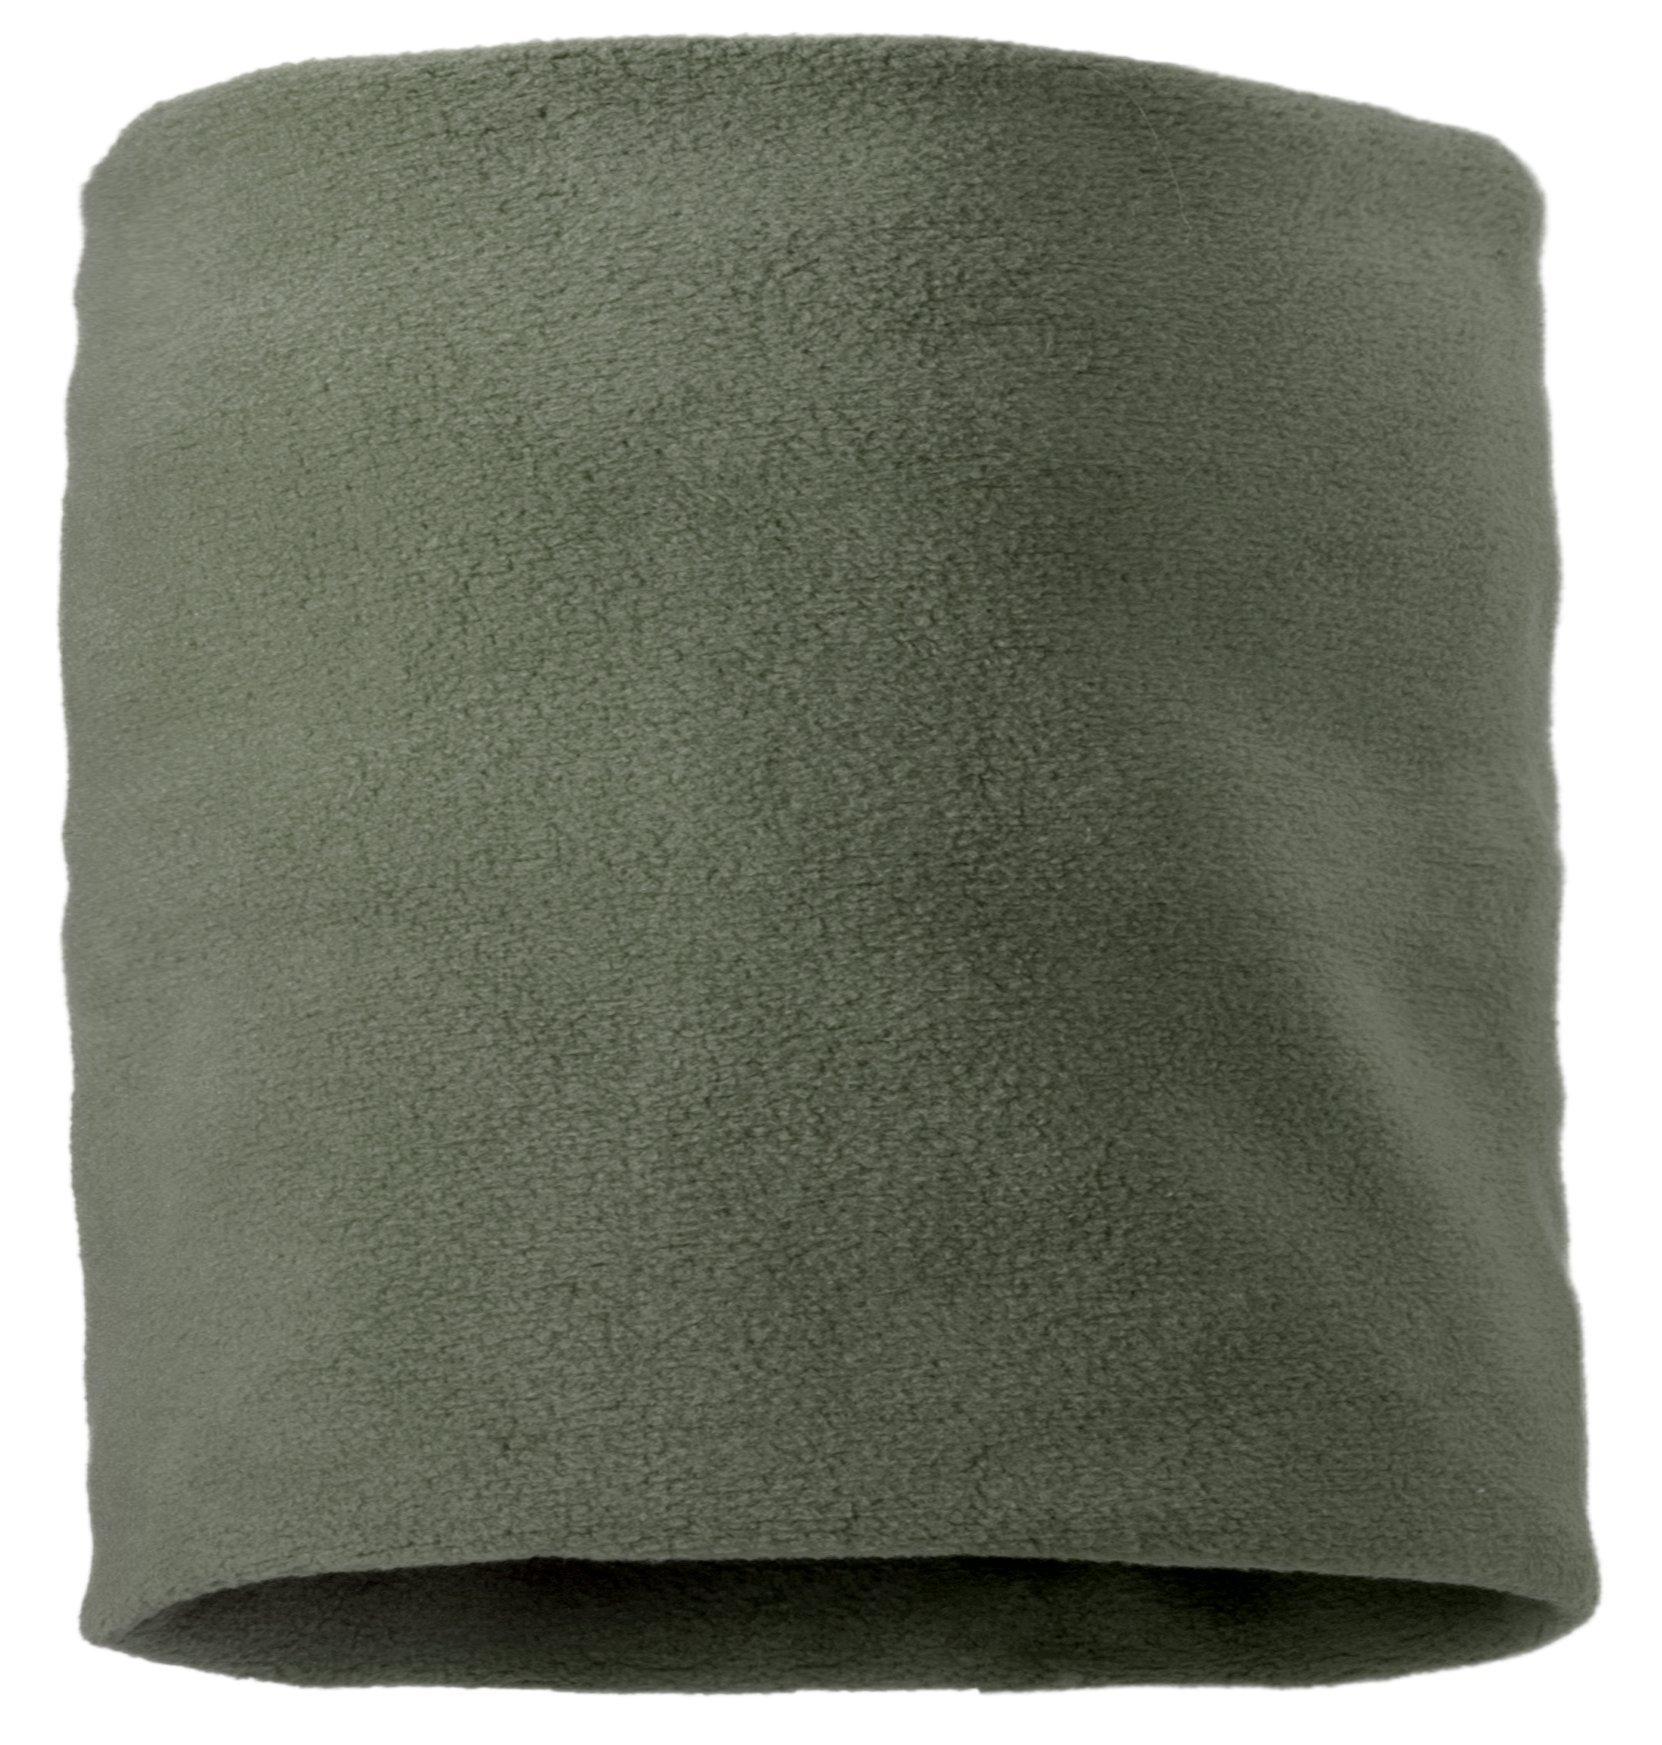 Screamer Fleece Neck Gaiter, Fatigue, One Size